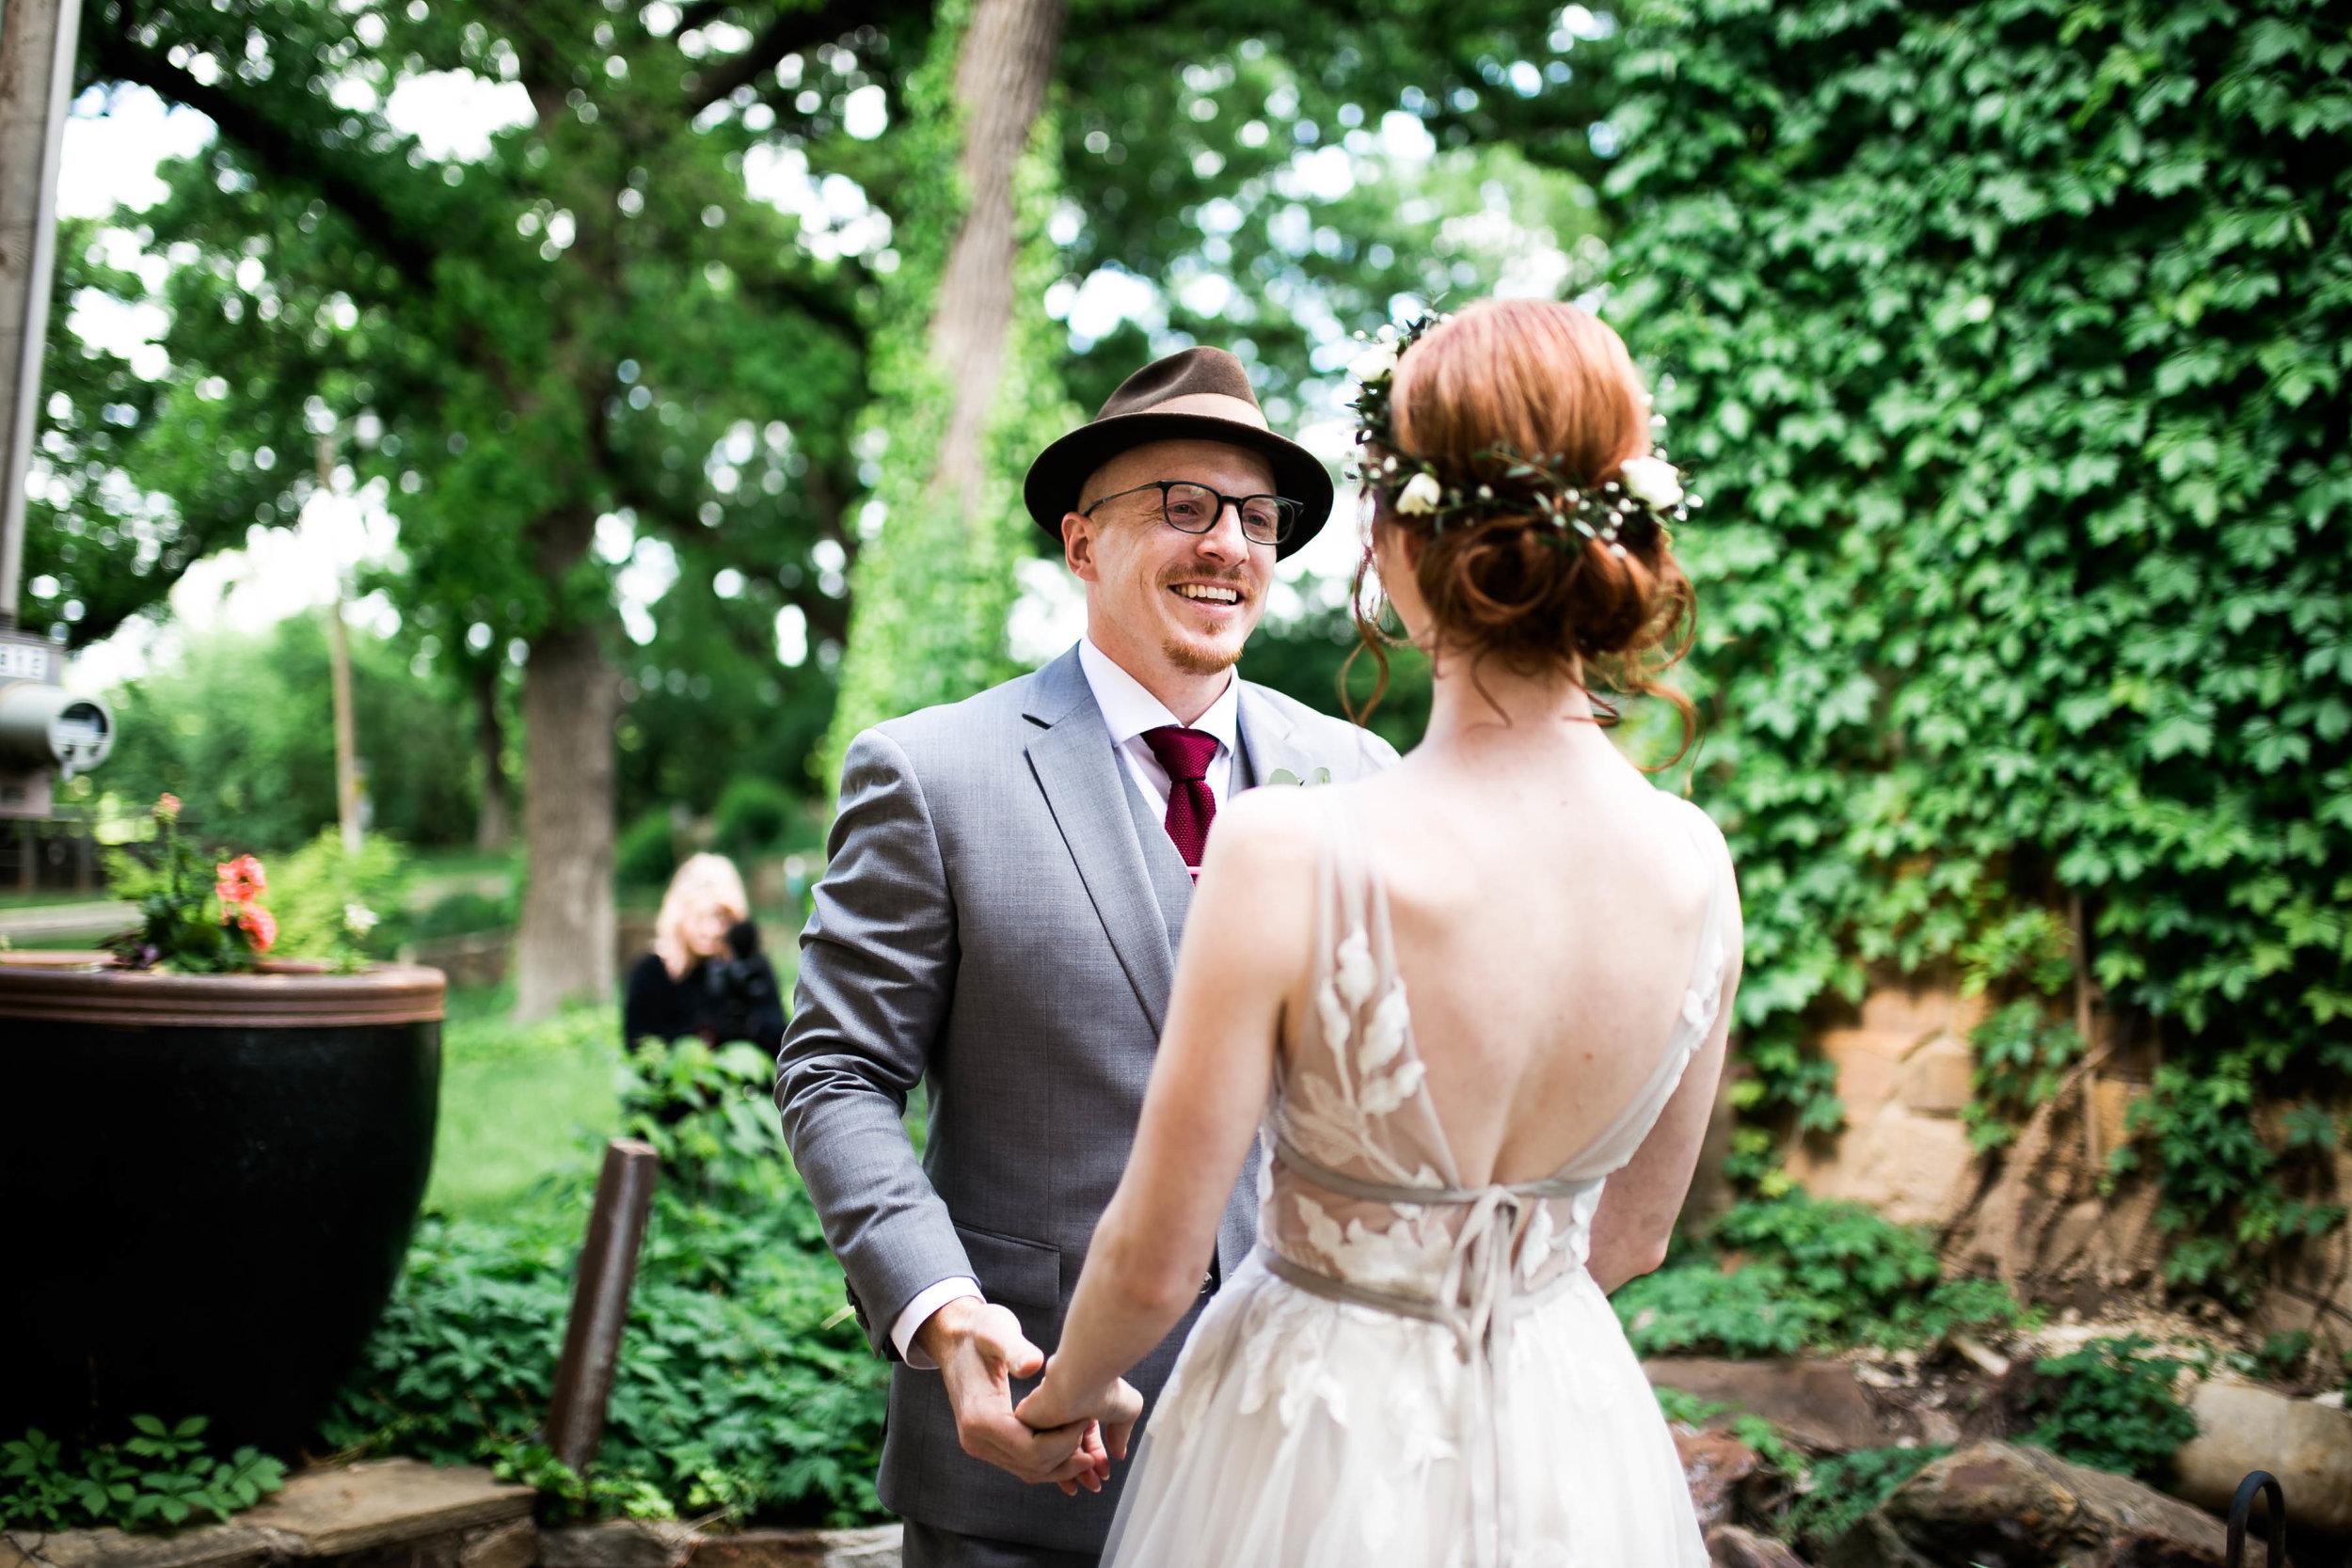 armstrong-wedding-166.jpg